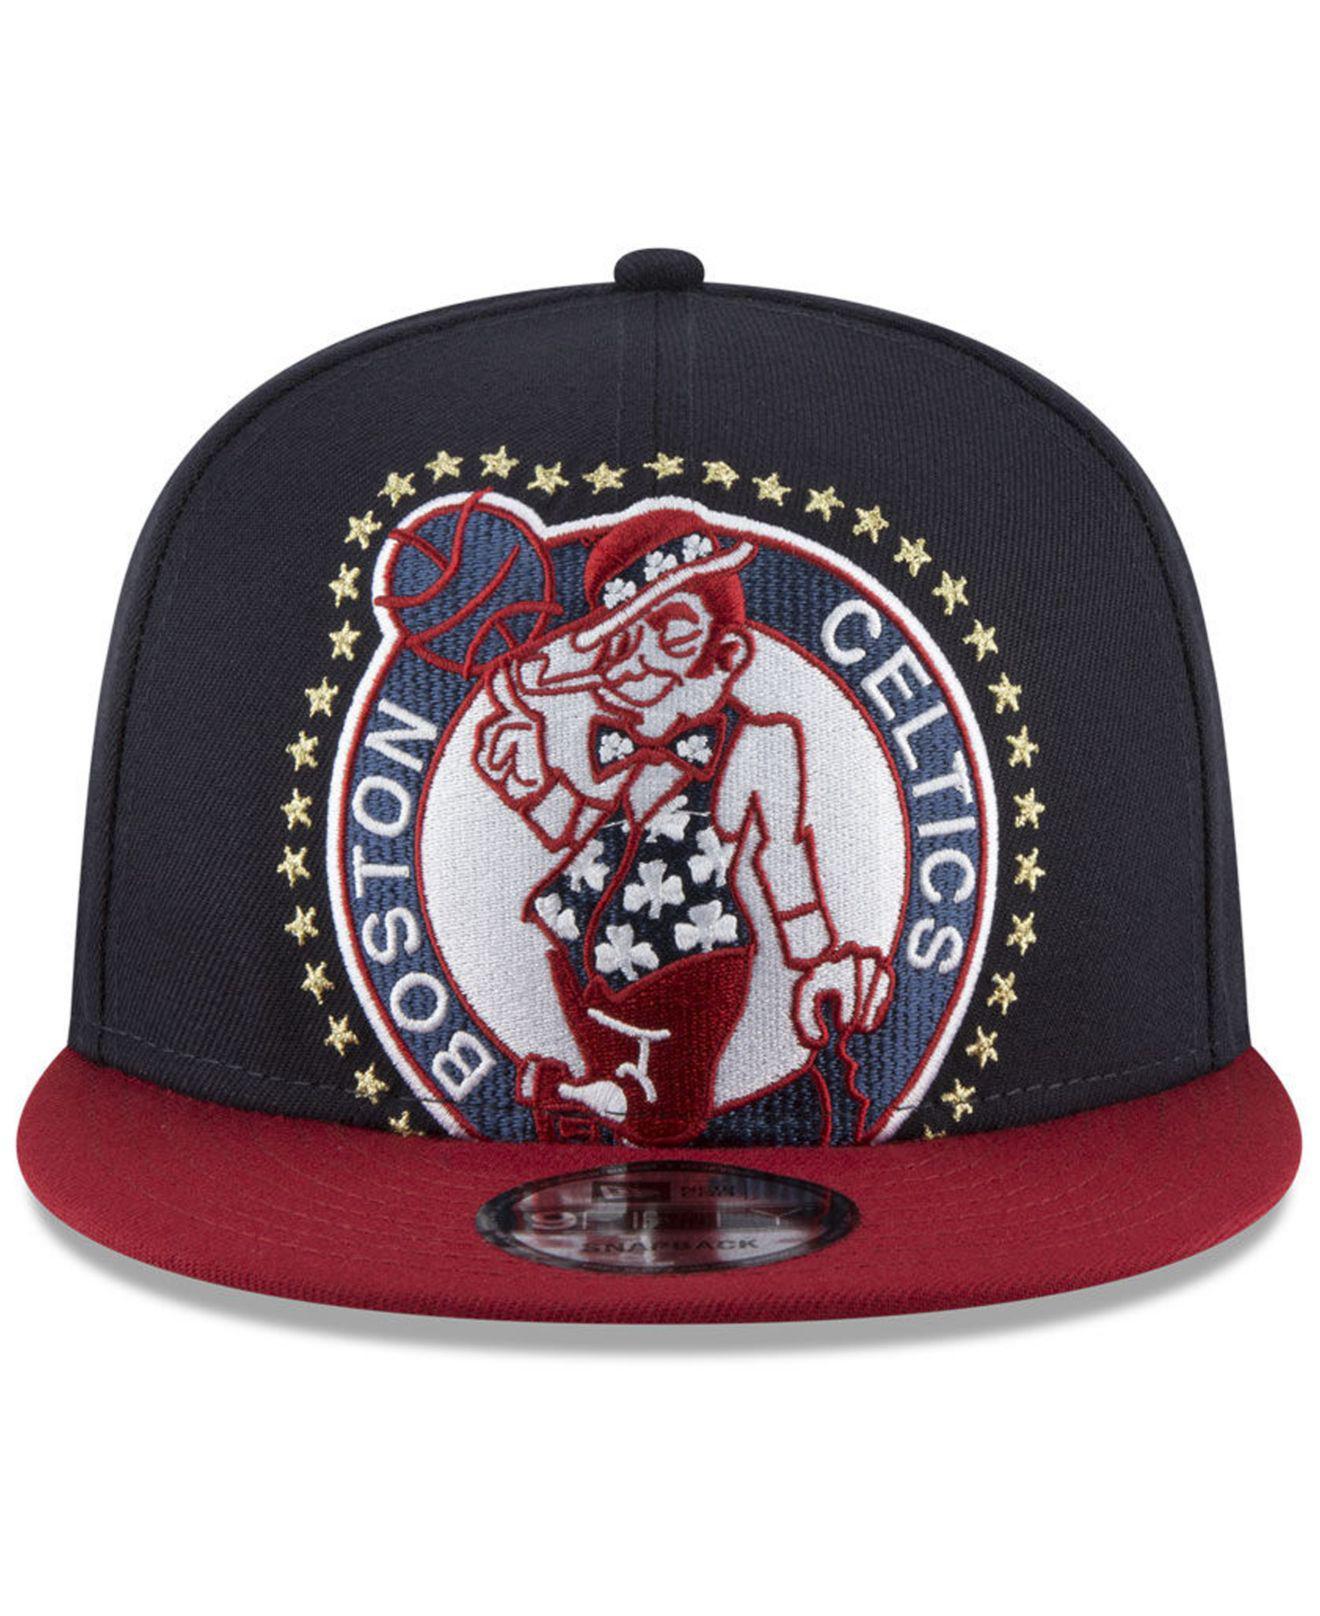 huge discount f4c39 0cd18 Lyst - KTZ Boston Celtics Xl Americana 9fifty Snapback Cap in Blue ...